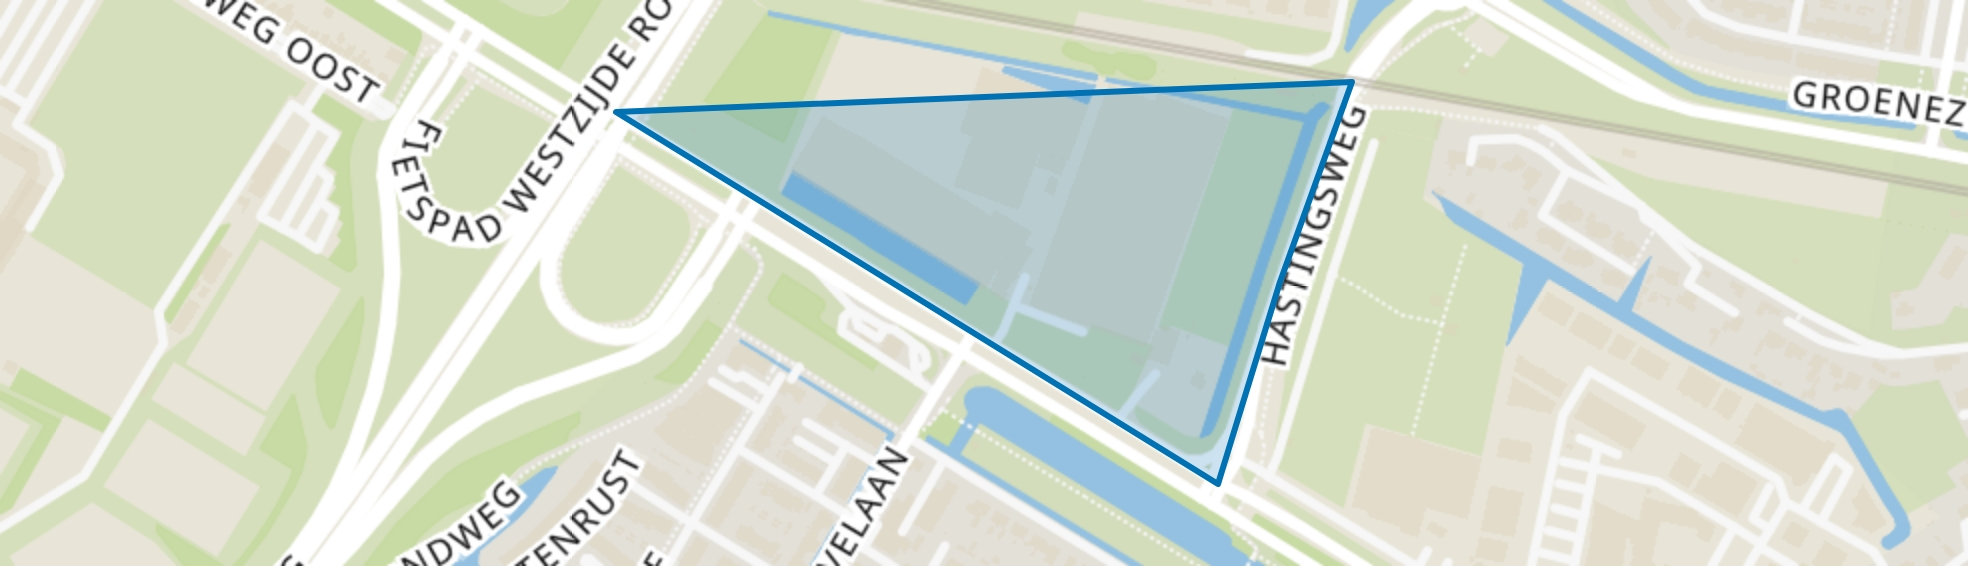 Vissersdijk-West, Dordrecht map